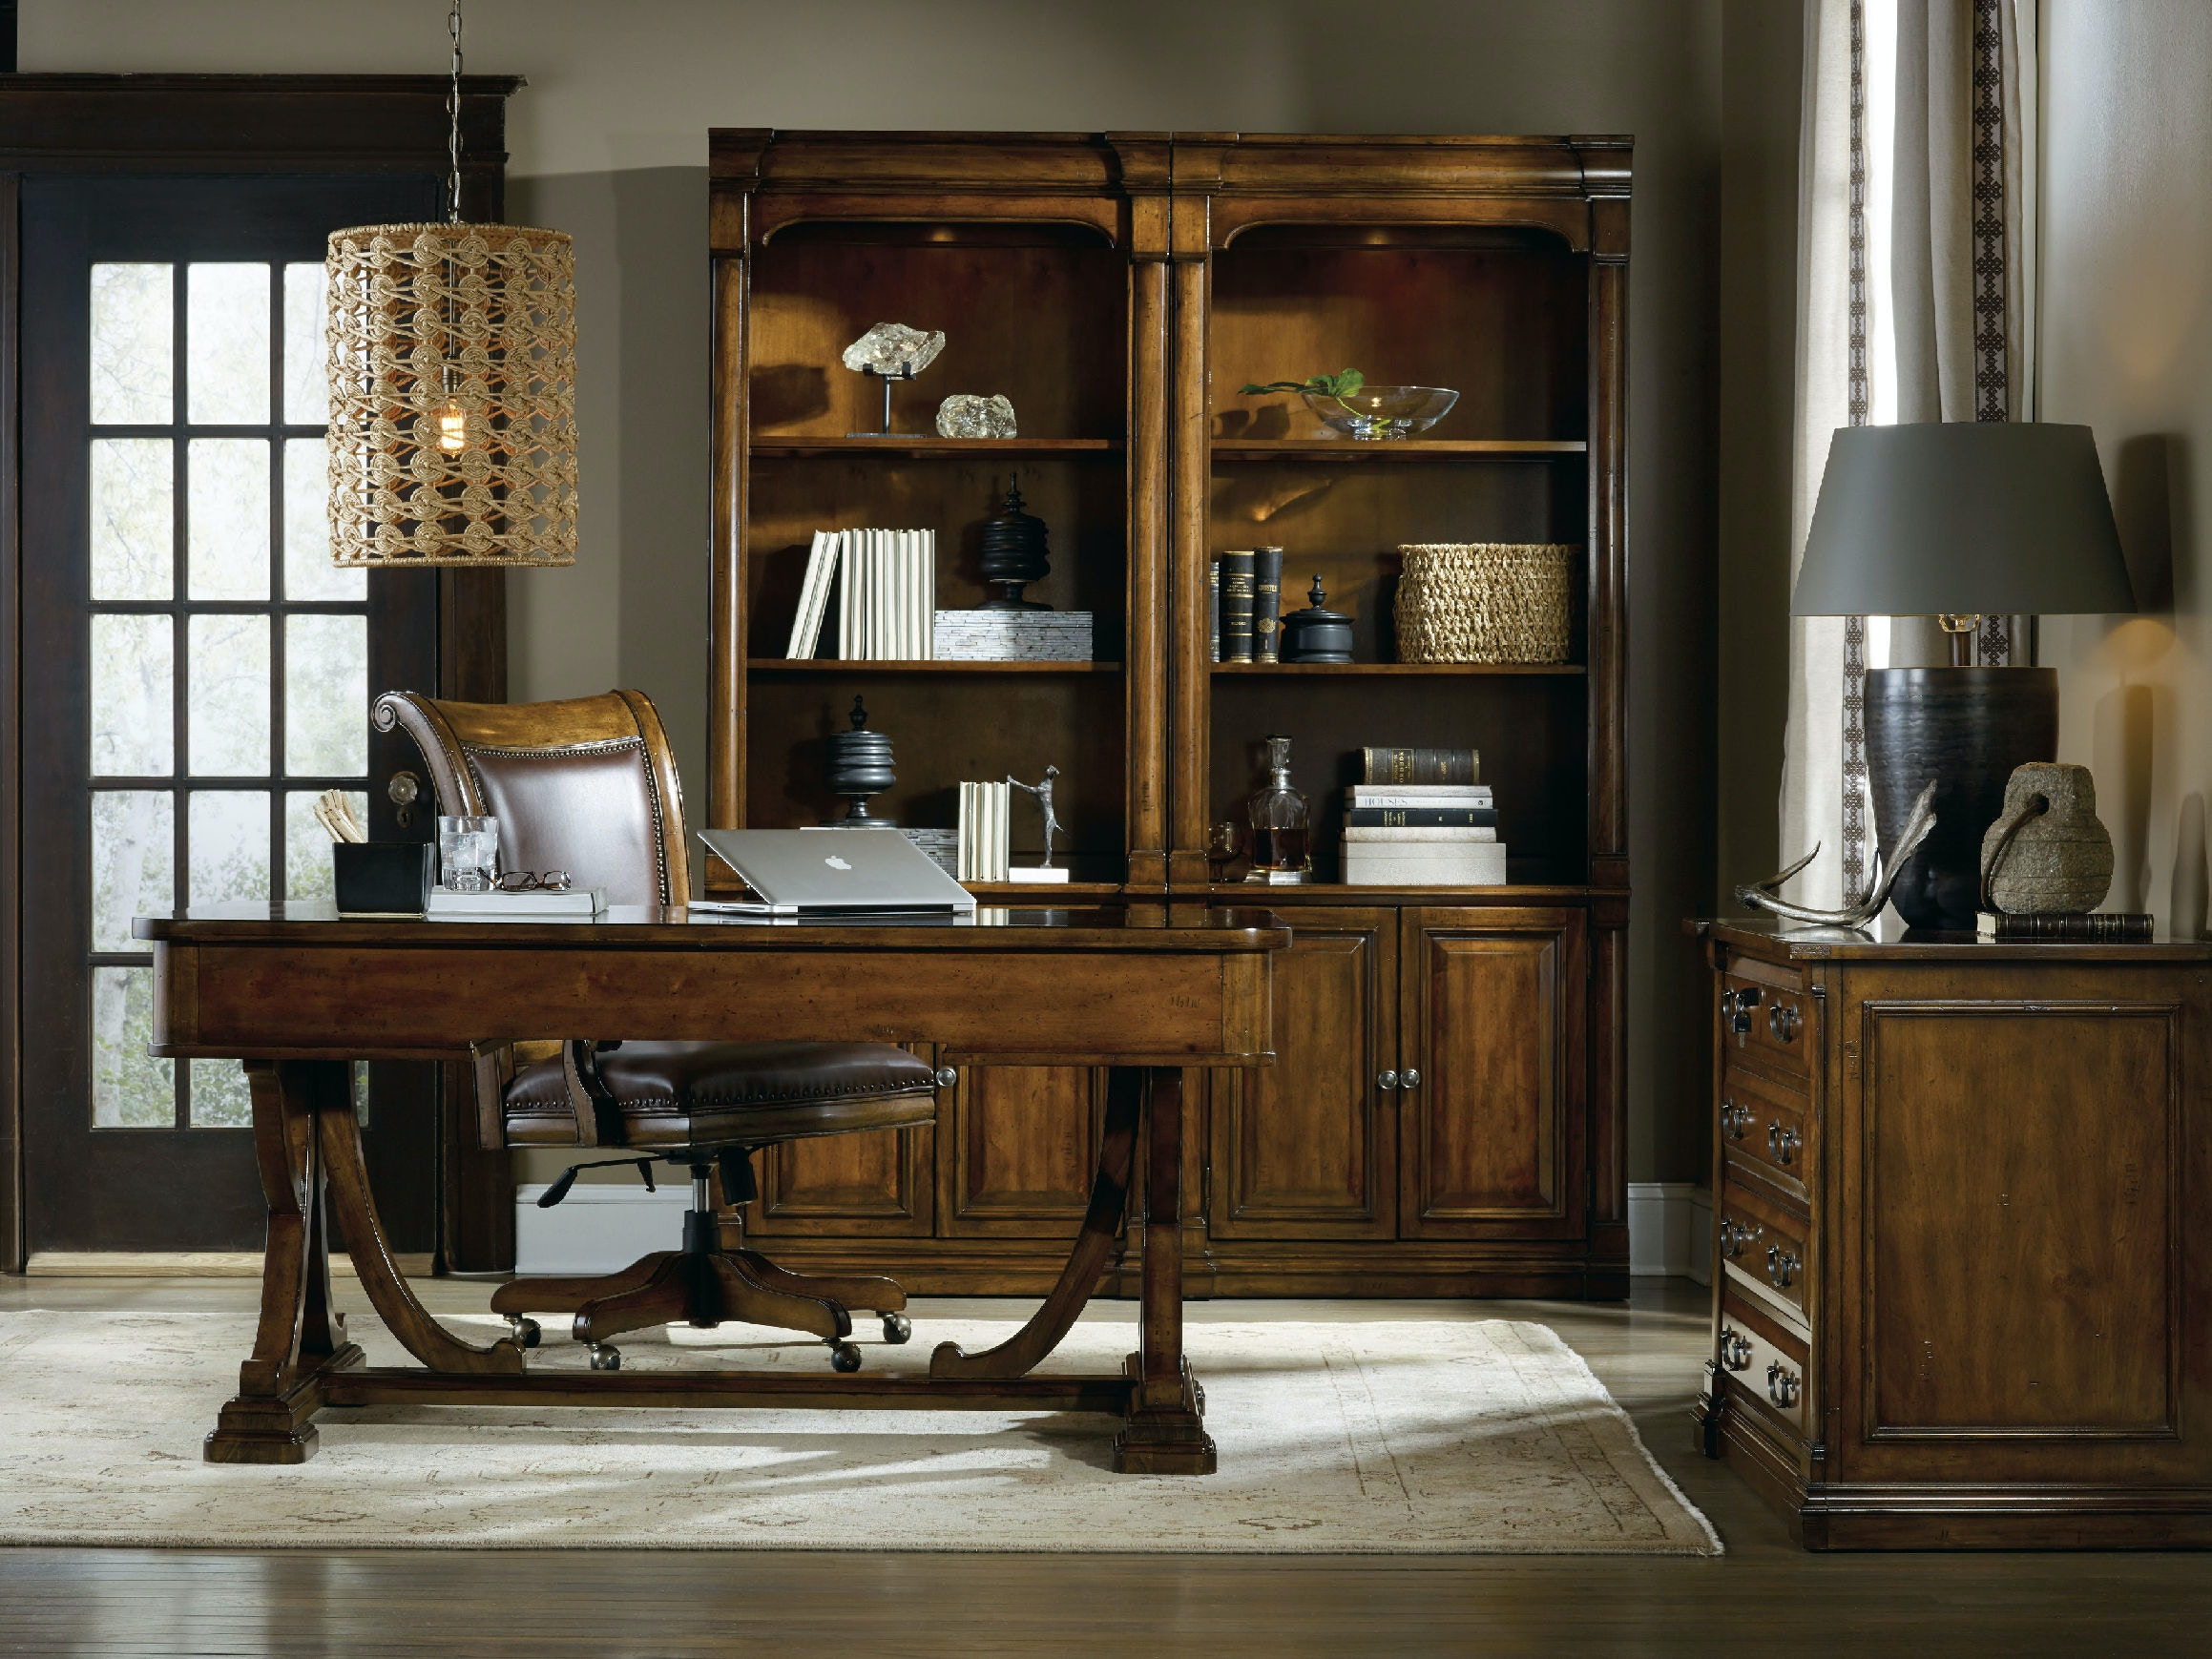 hooker desk chair lumbar support furniture home office tynecastle tilt swivel